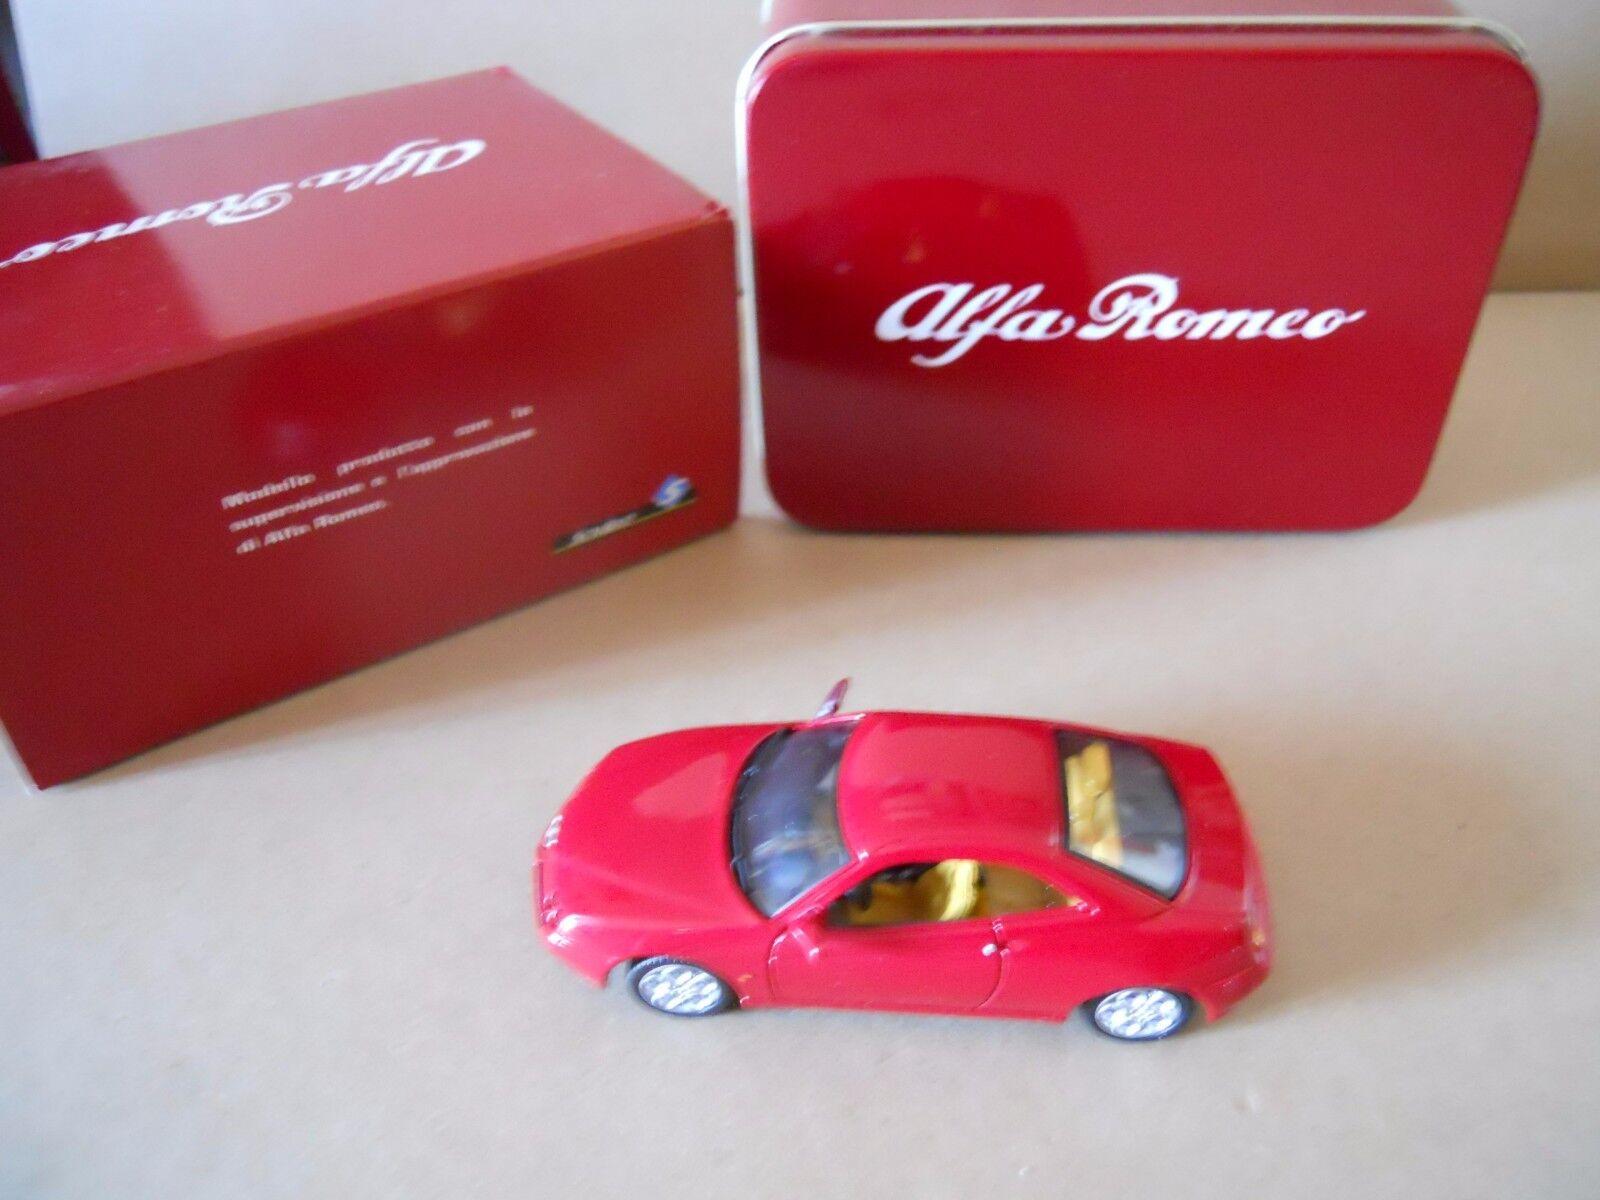 ALFA ROMEO Alfa GTO 1995 1:43 Die Die Die Cast Model SOLIDO in metal box  [MV00] 5a7cdf